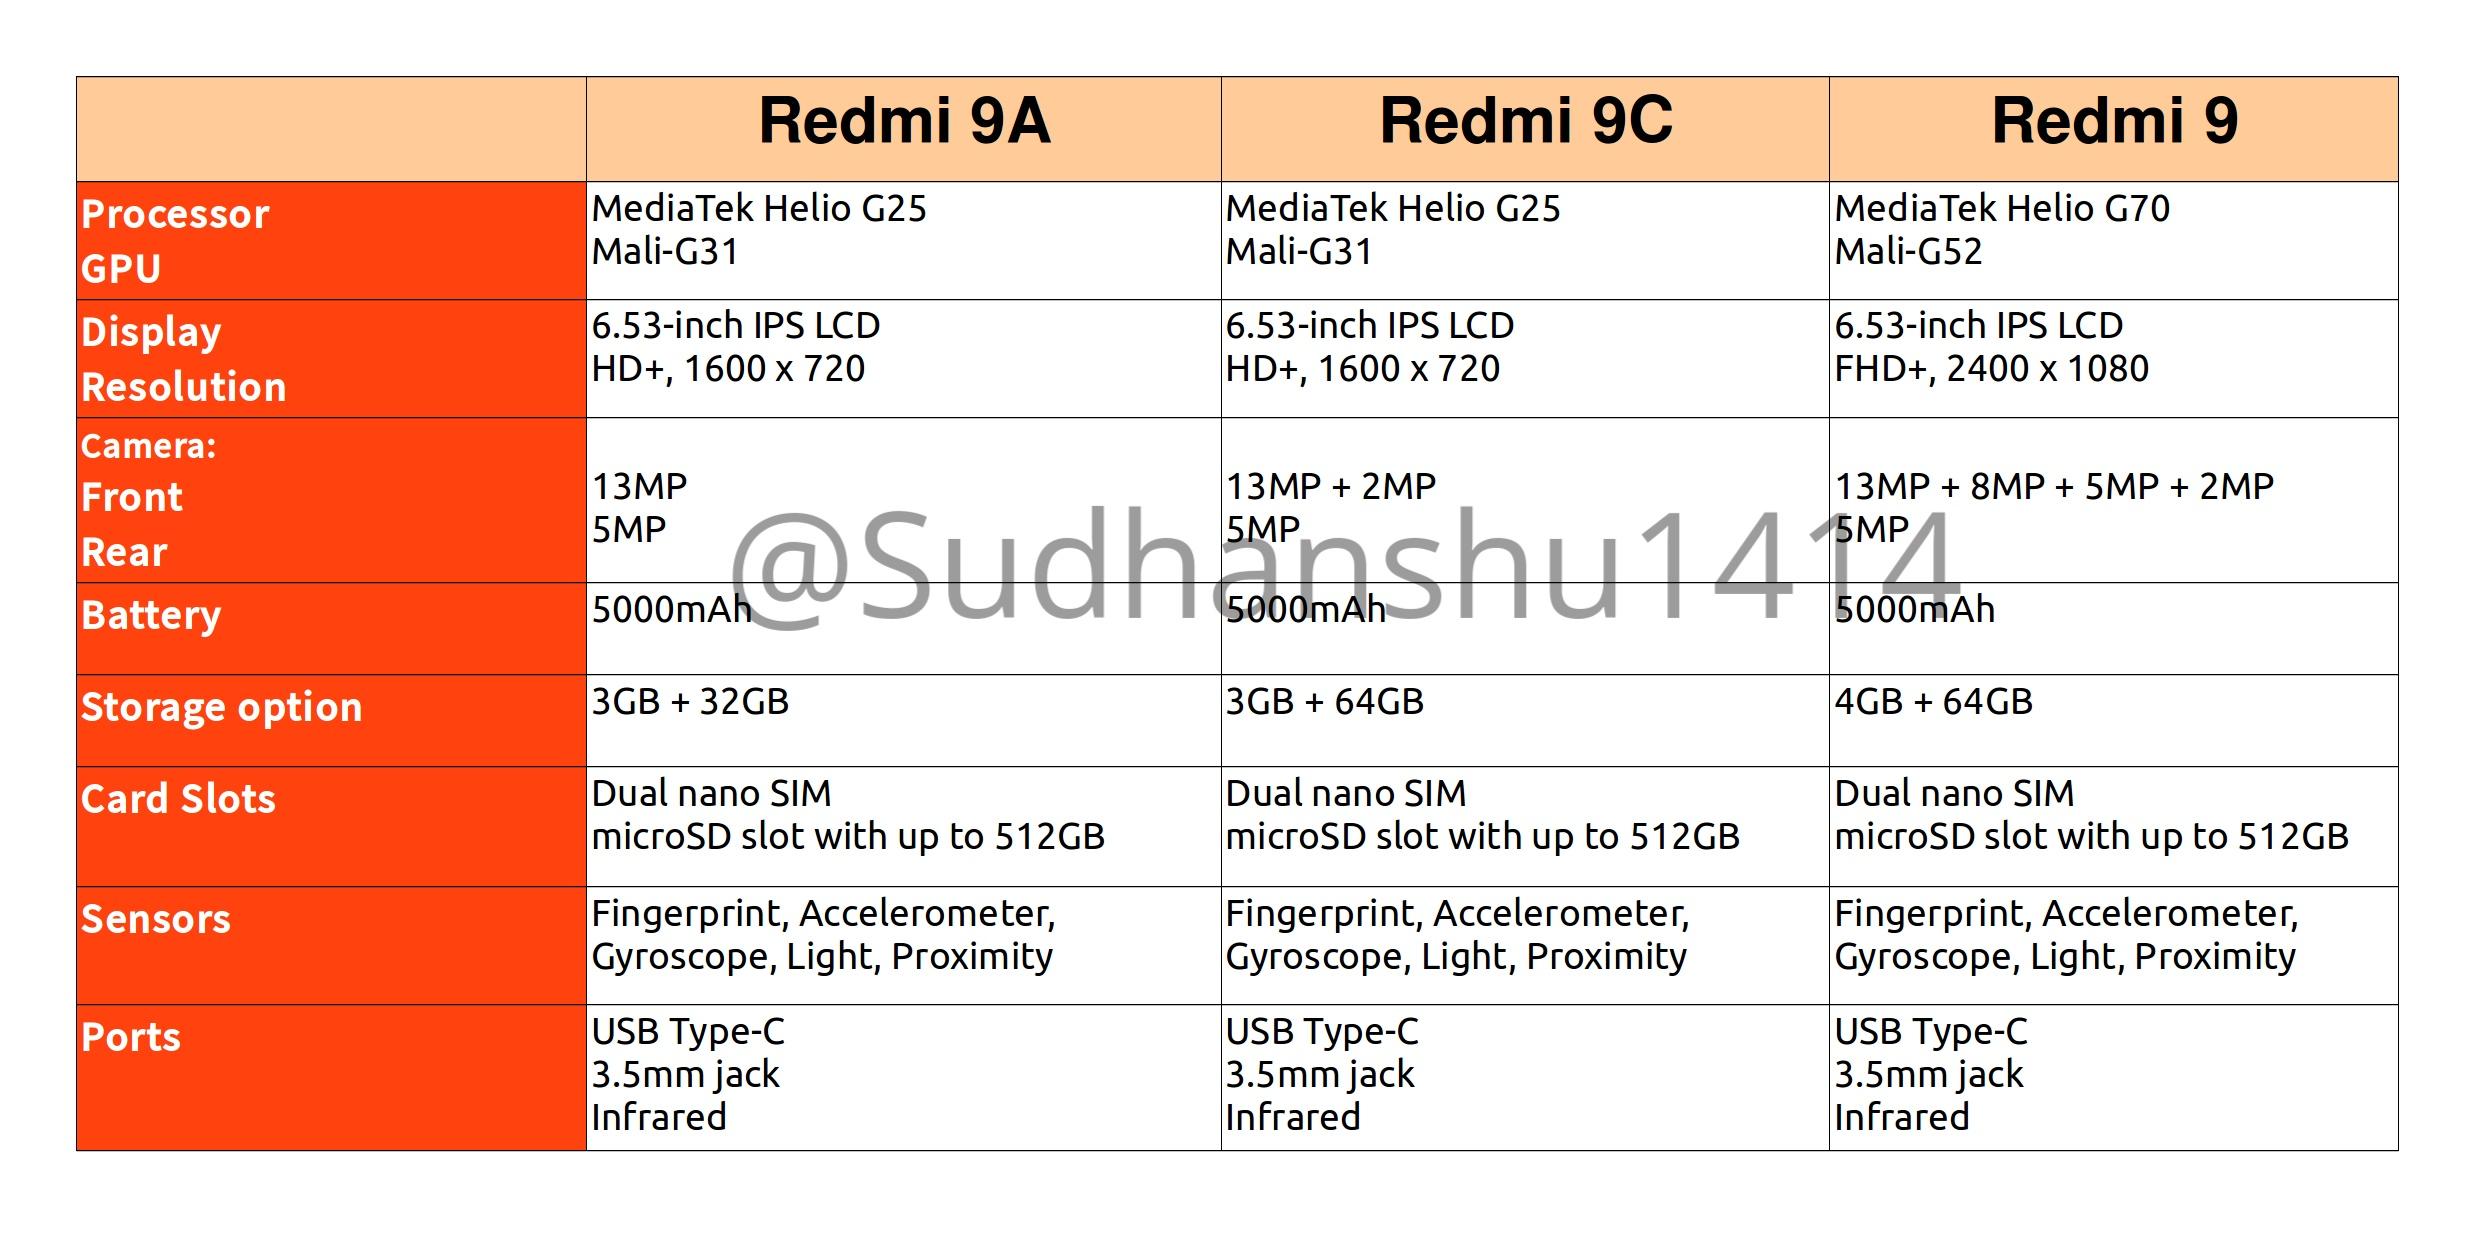 Xiaomi Redmi 9A Redmi 9C without NFC Redmi 9 specs